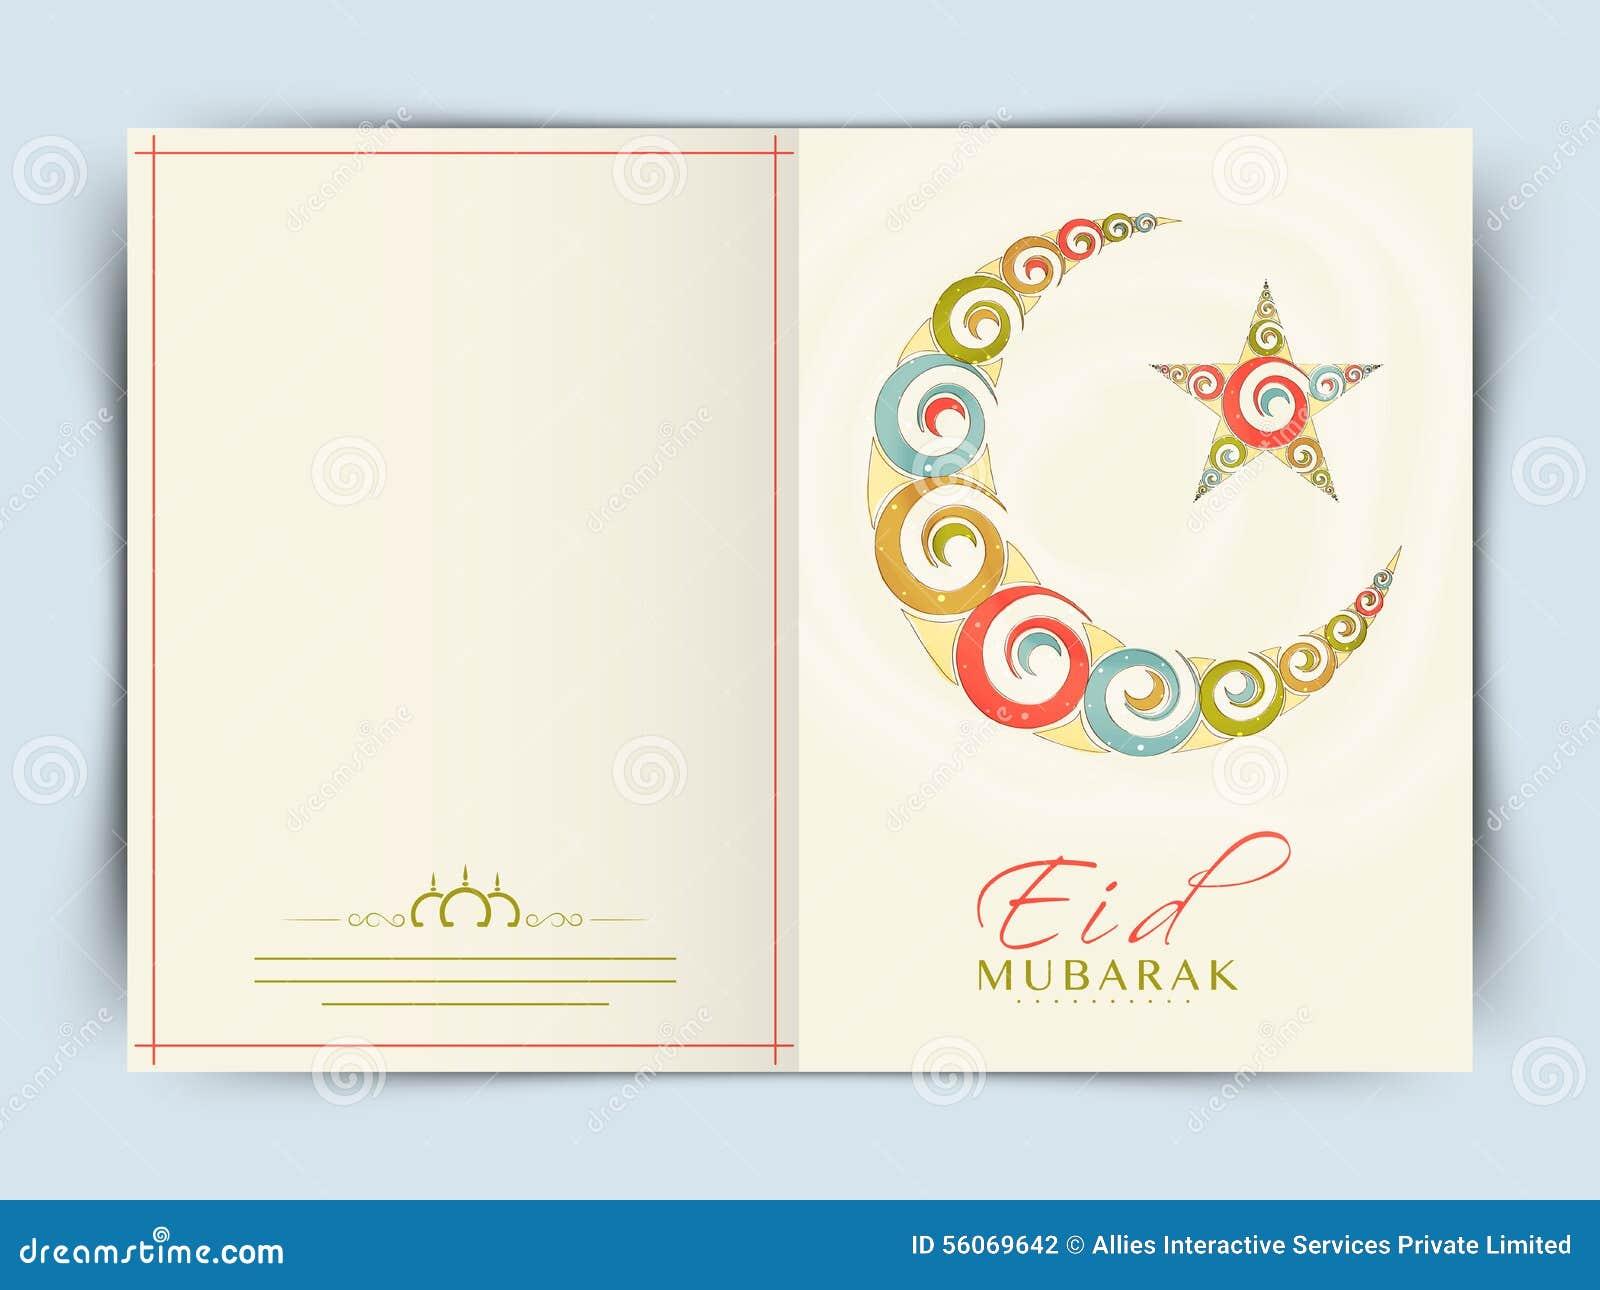 Eid mubarak celebration greeting card stock illustration eid mubarak celebration greeting card kristyandbryce Image collections